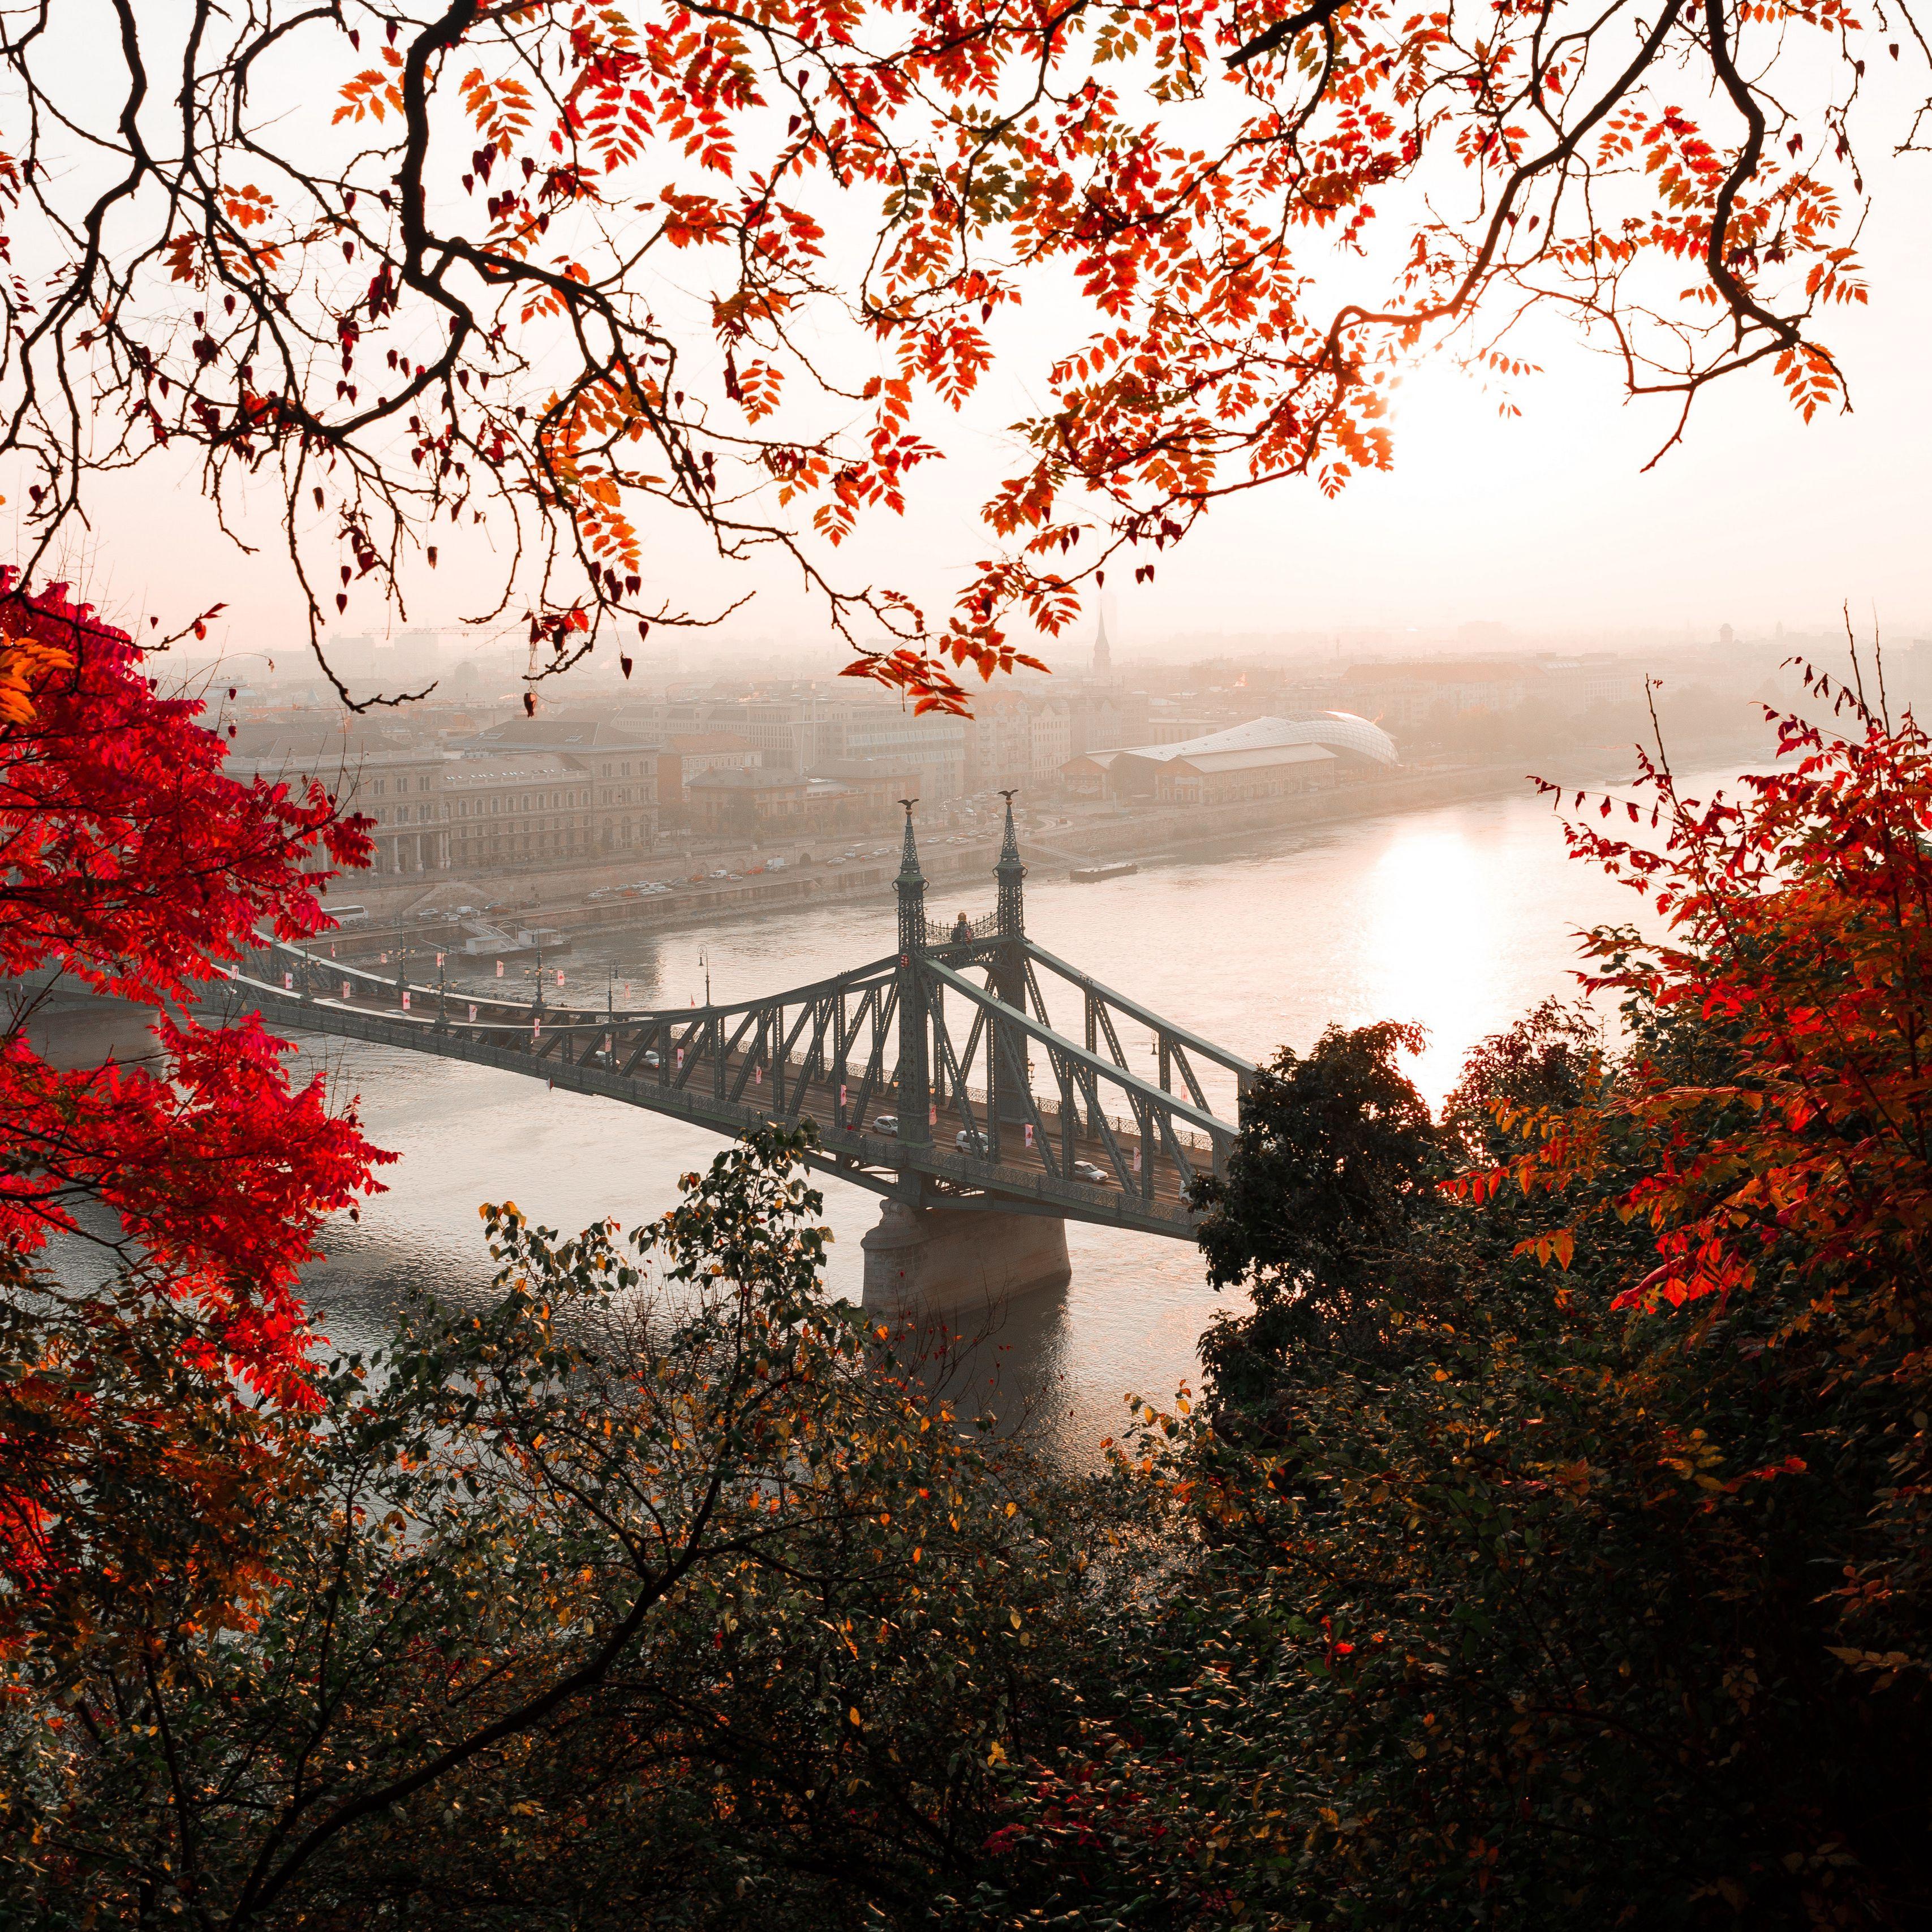 3415x3415 Wallpaper bridge, autumn, city, citadella, budapest, hungary